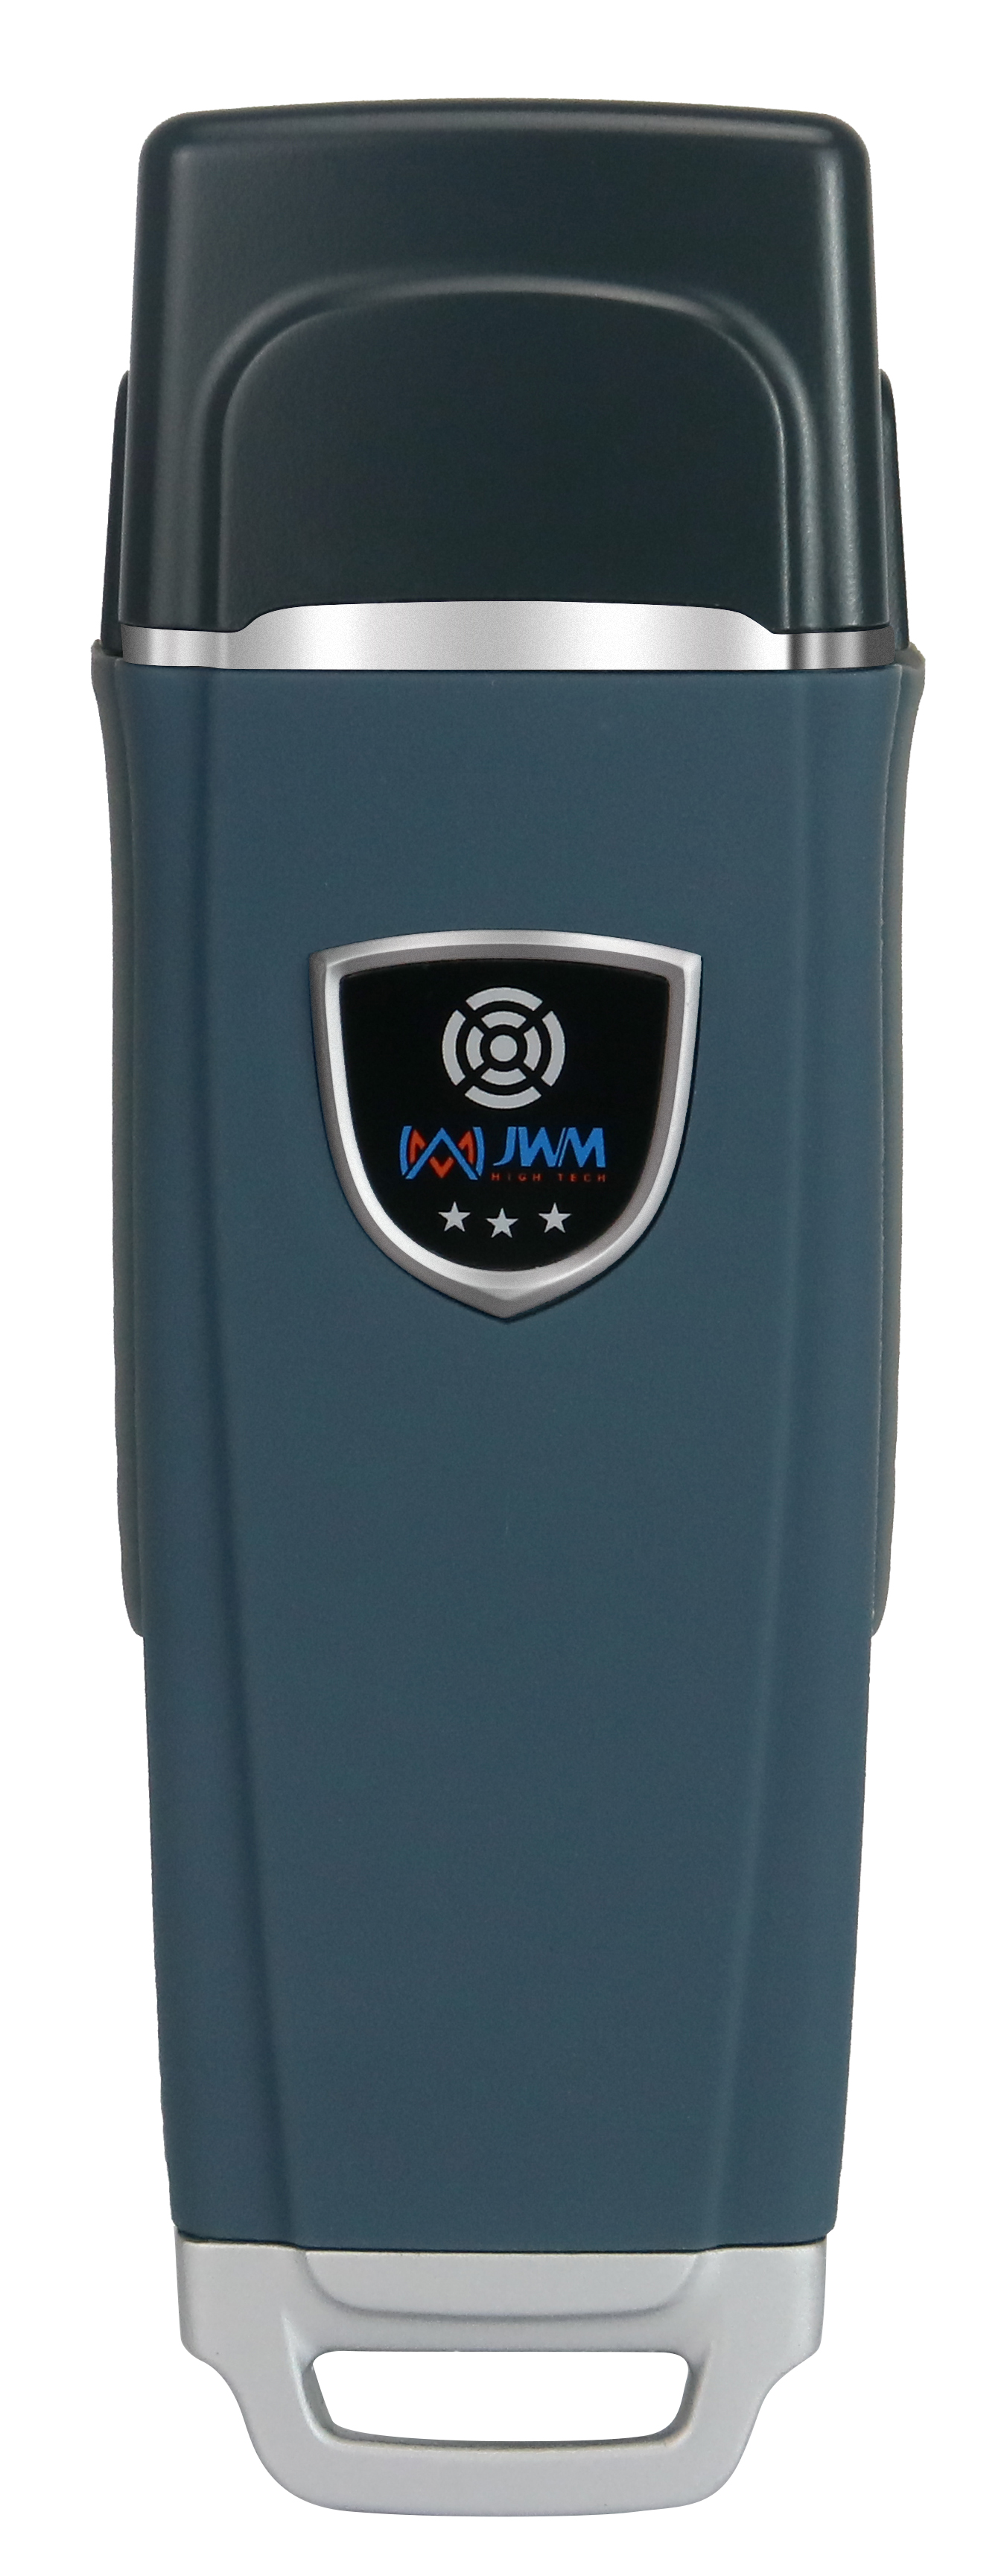 2019 JWM Waterproof RFID Security Patrol Wand With 24 Tags